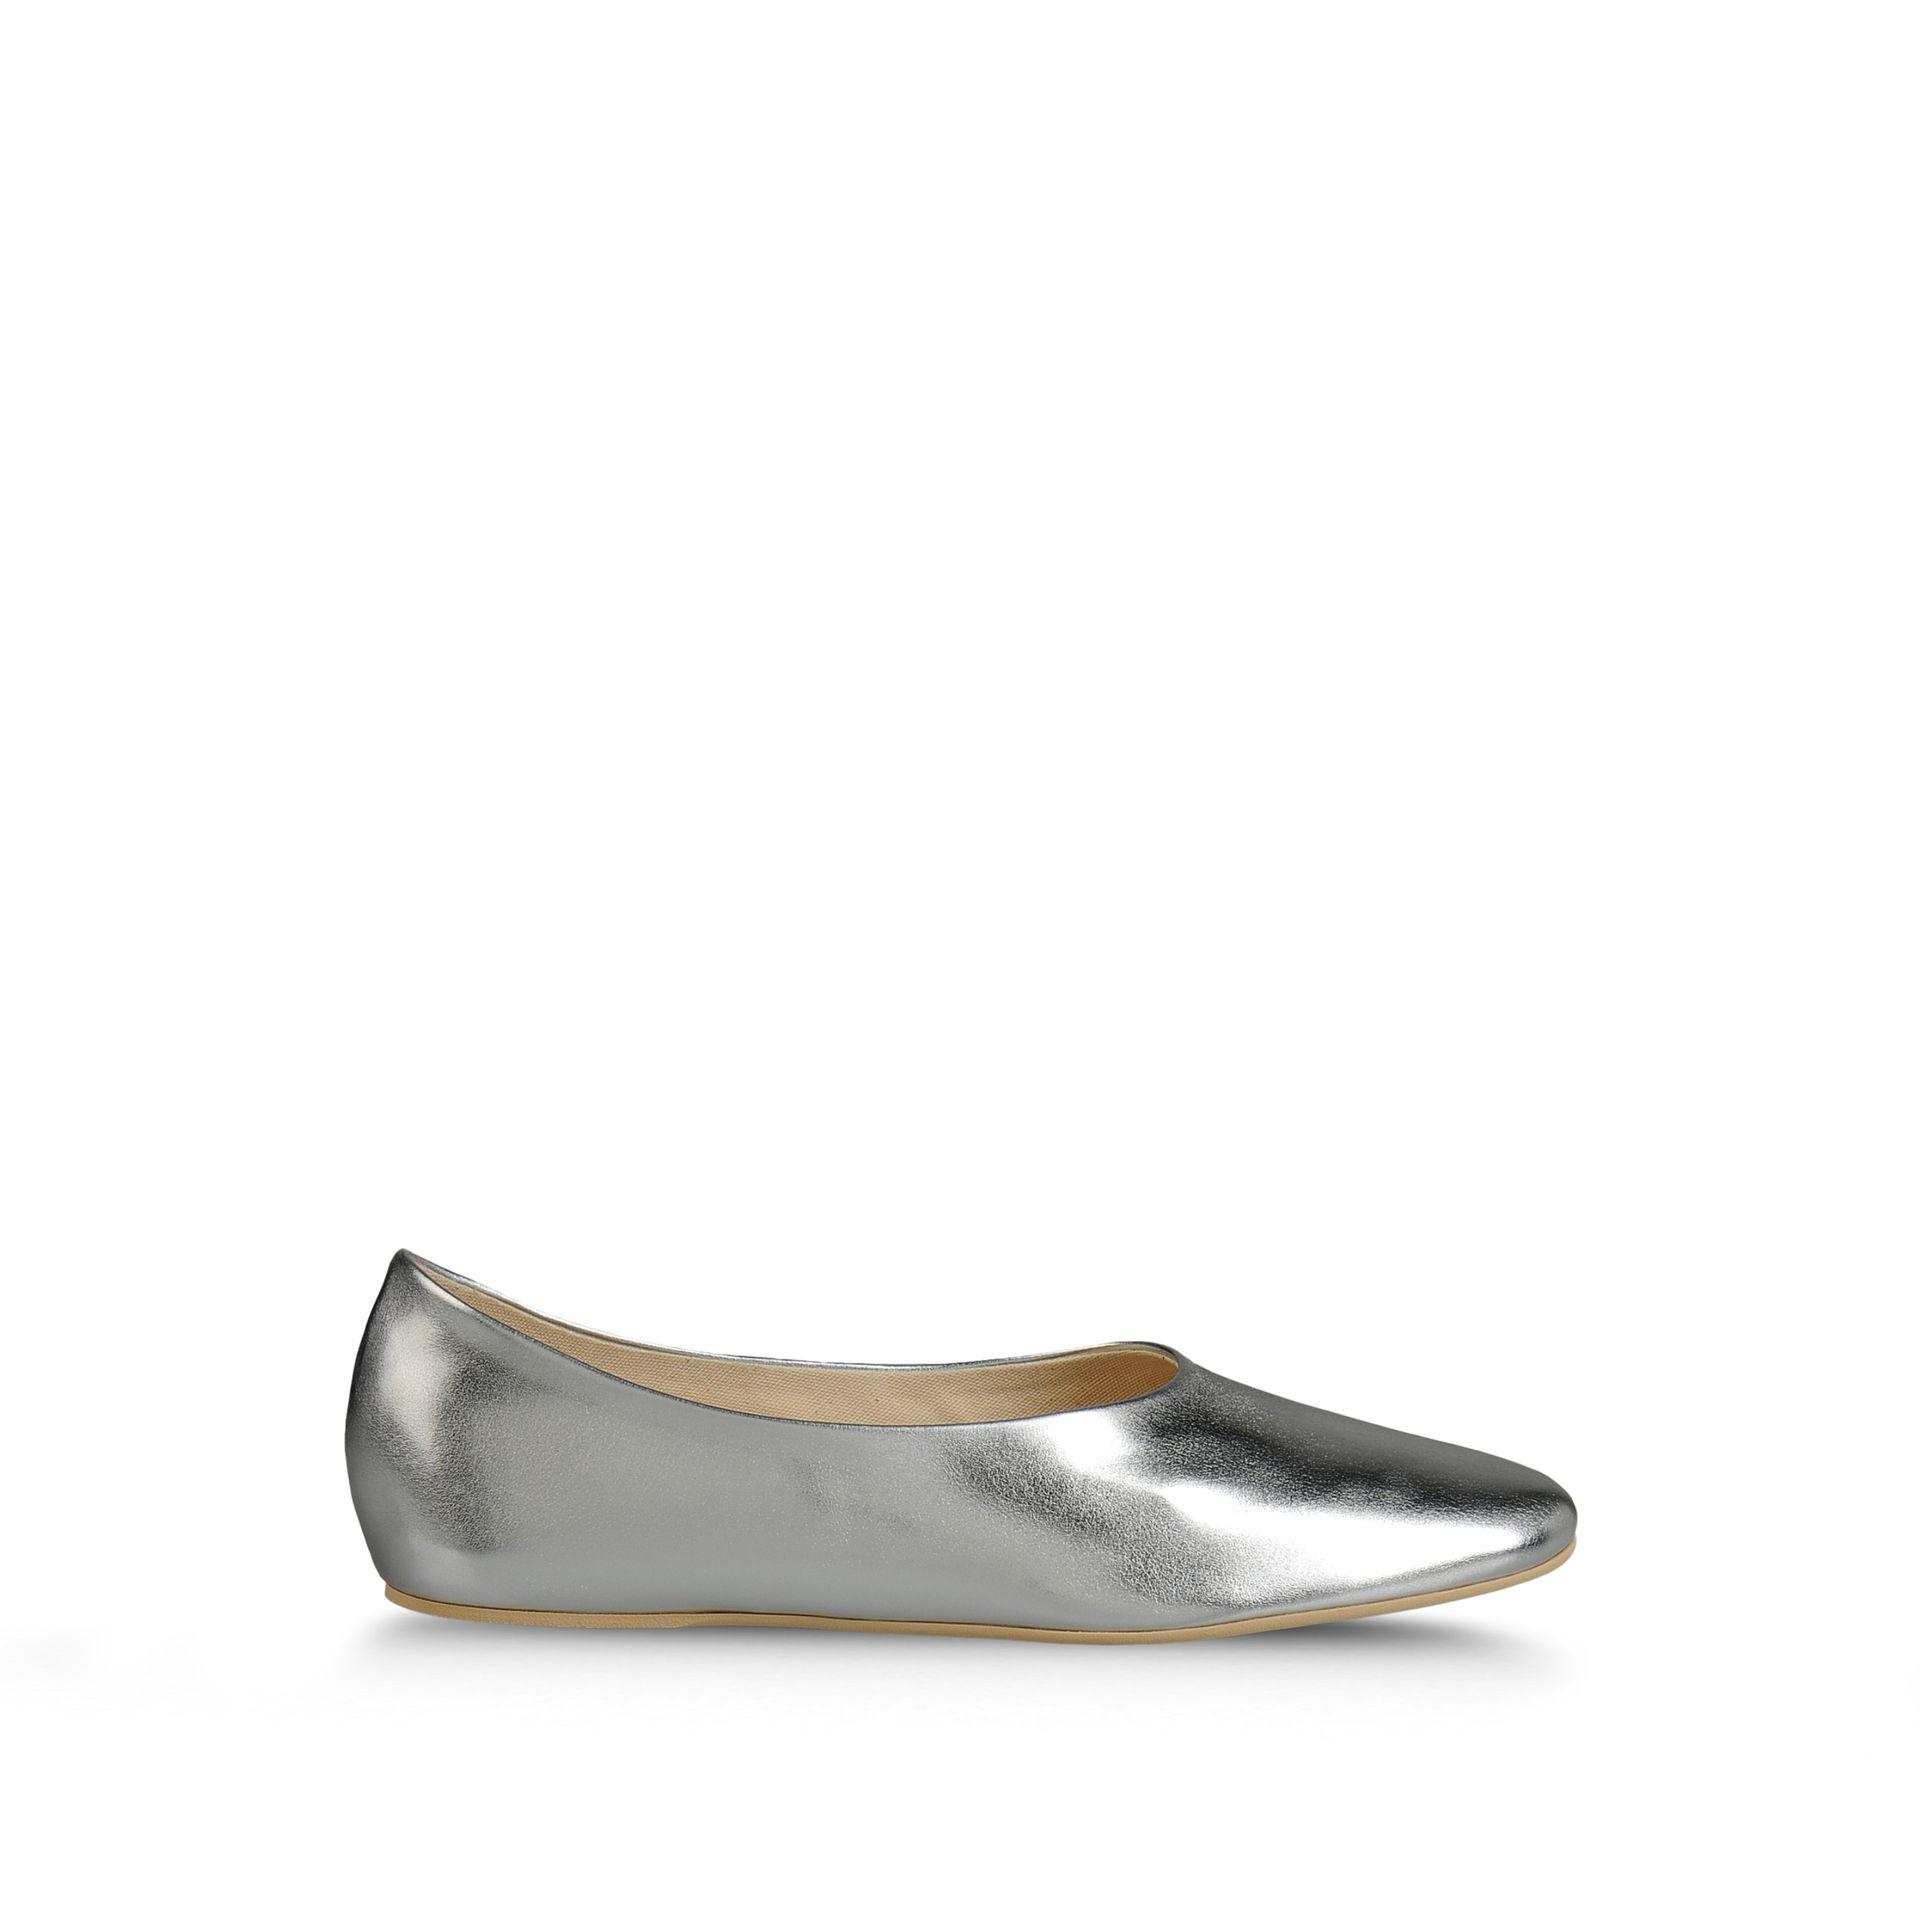 choice Stella McCartney Metallic Ballet Flats fashionable cheap online buy online new 100% original discount affordable RvaDGR